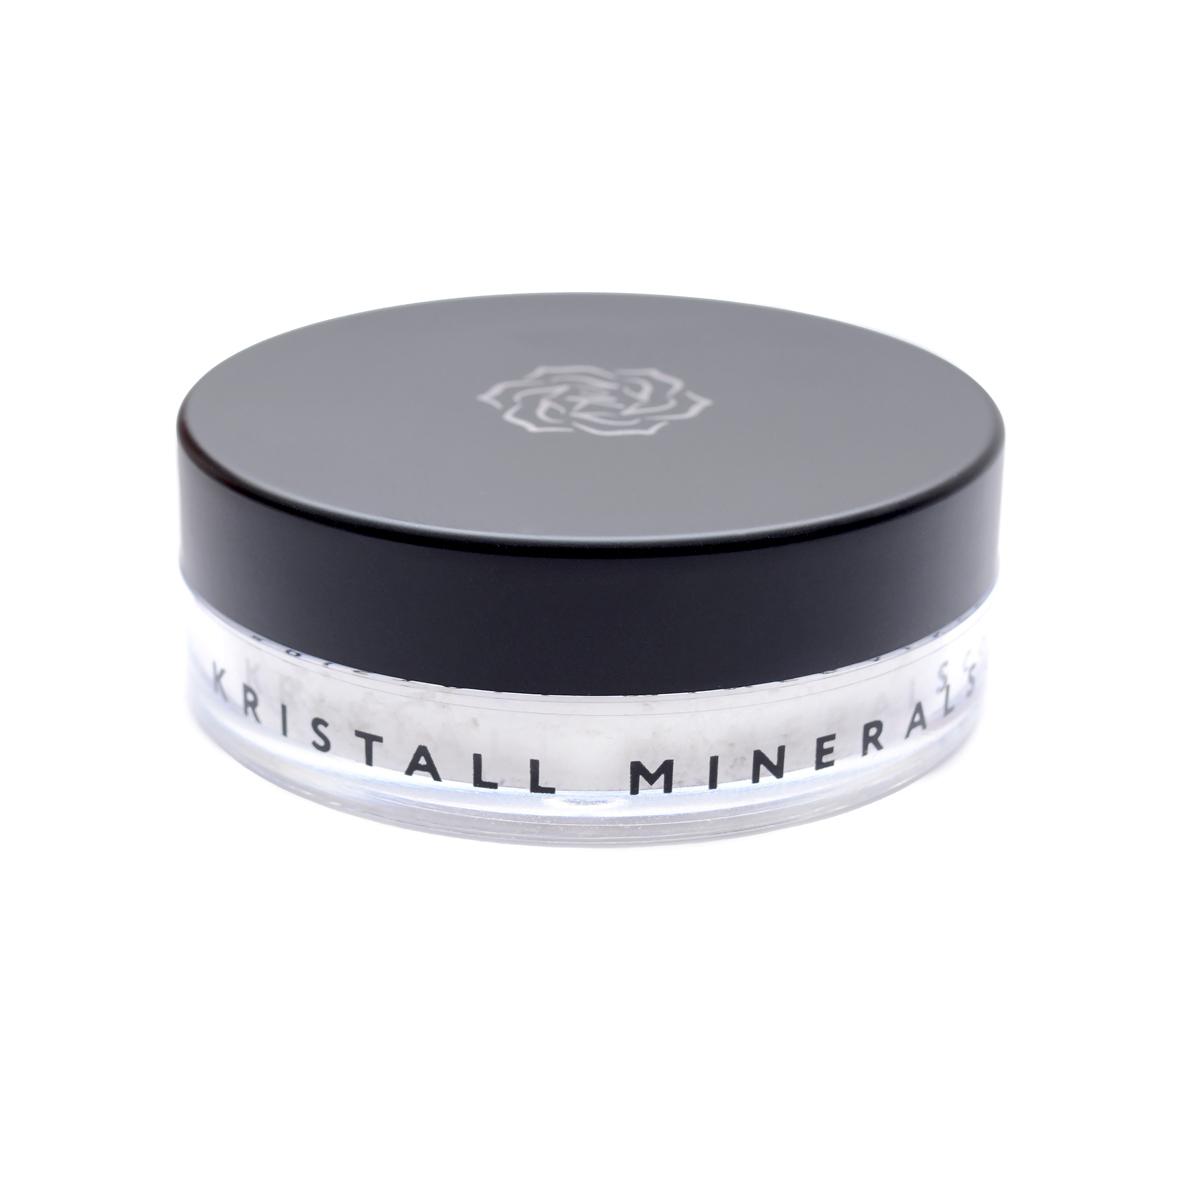 Минеральная HD пудра Kristall Minerals cosmetics